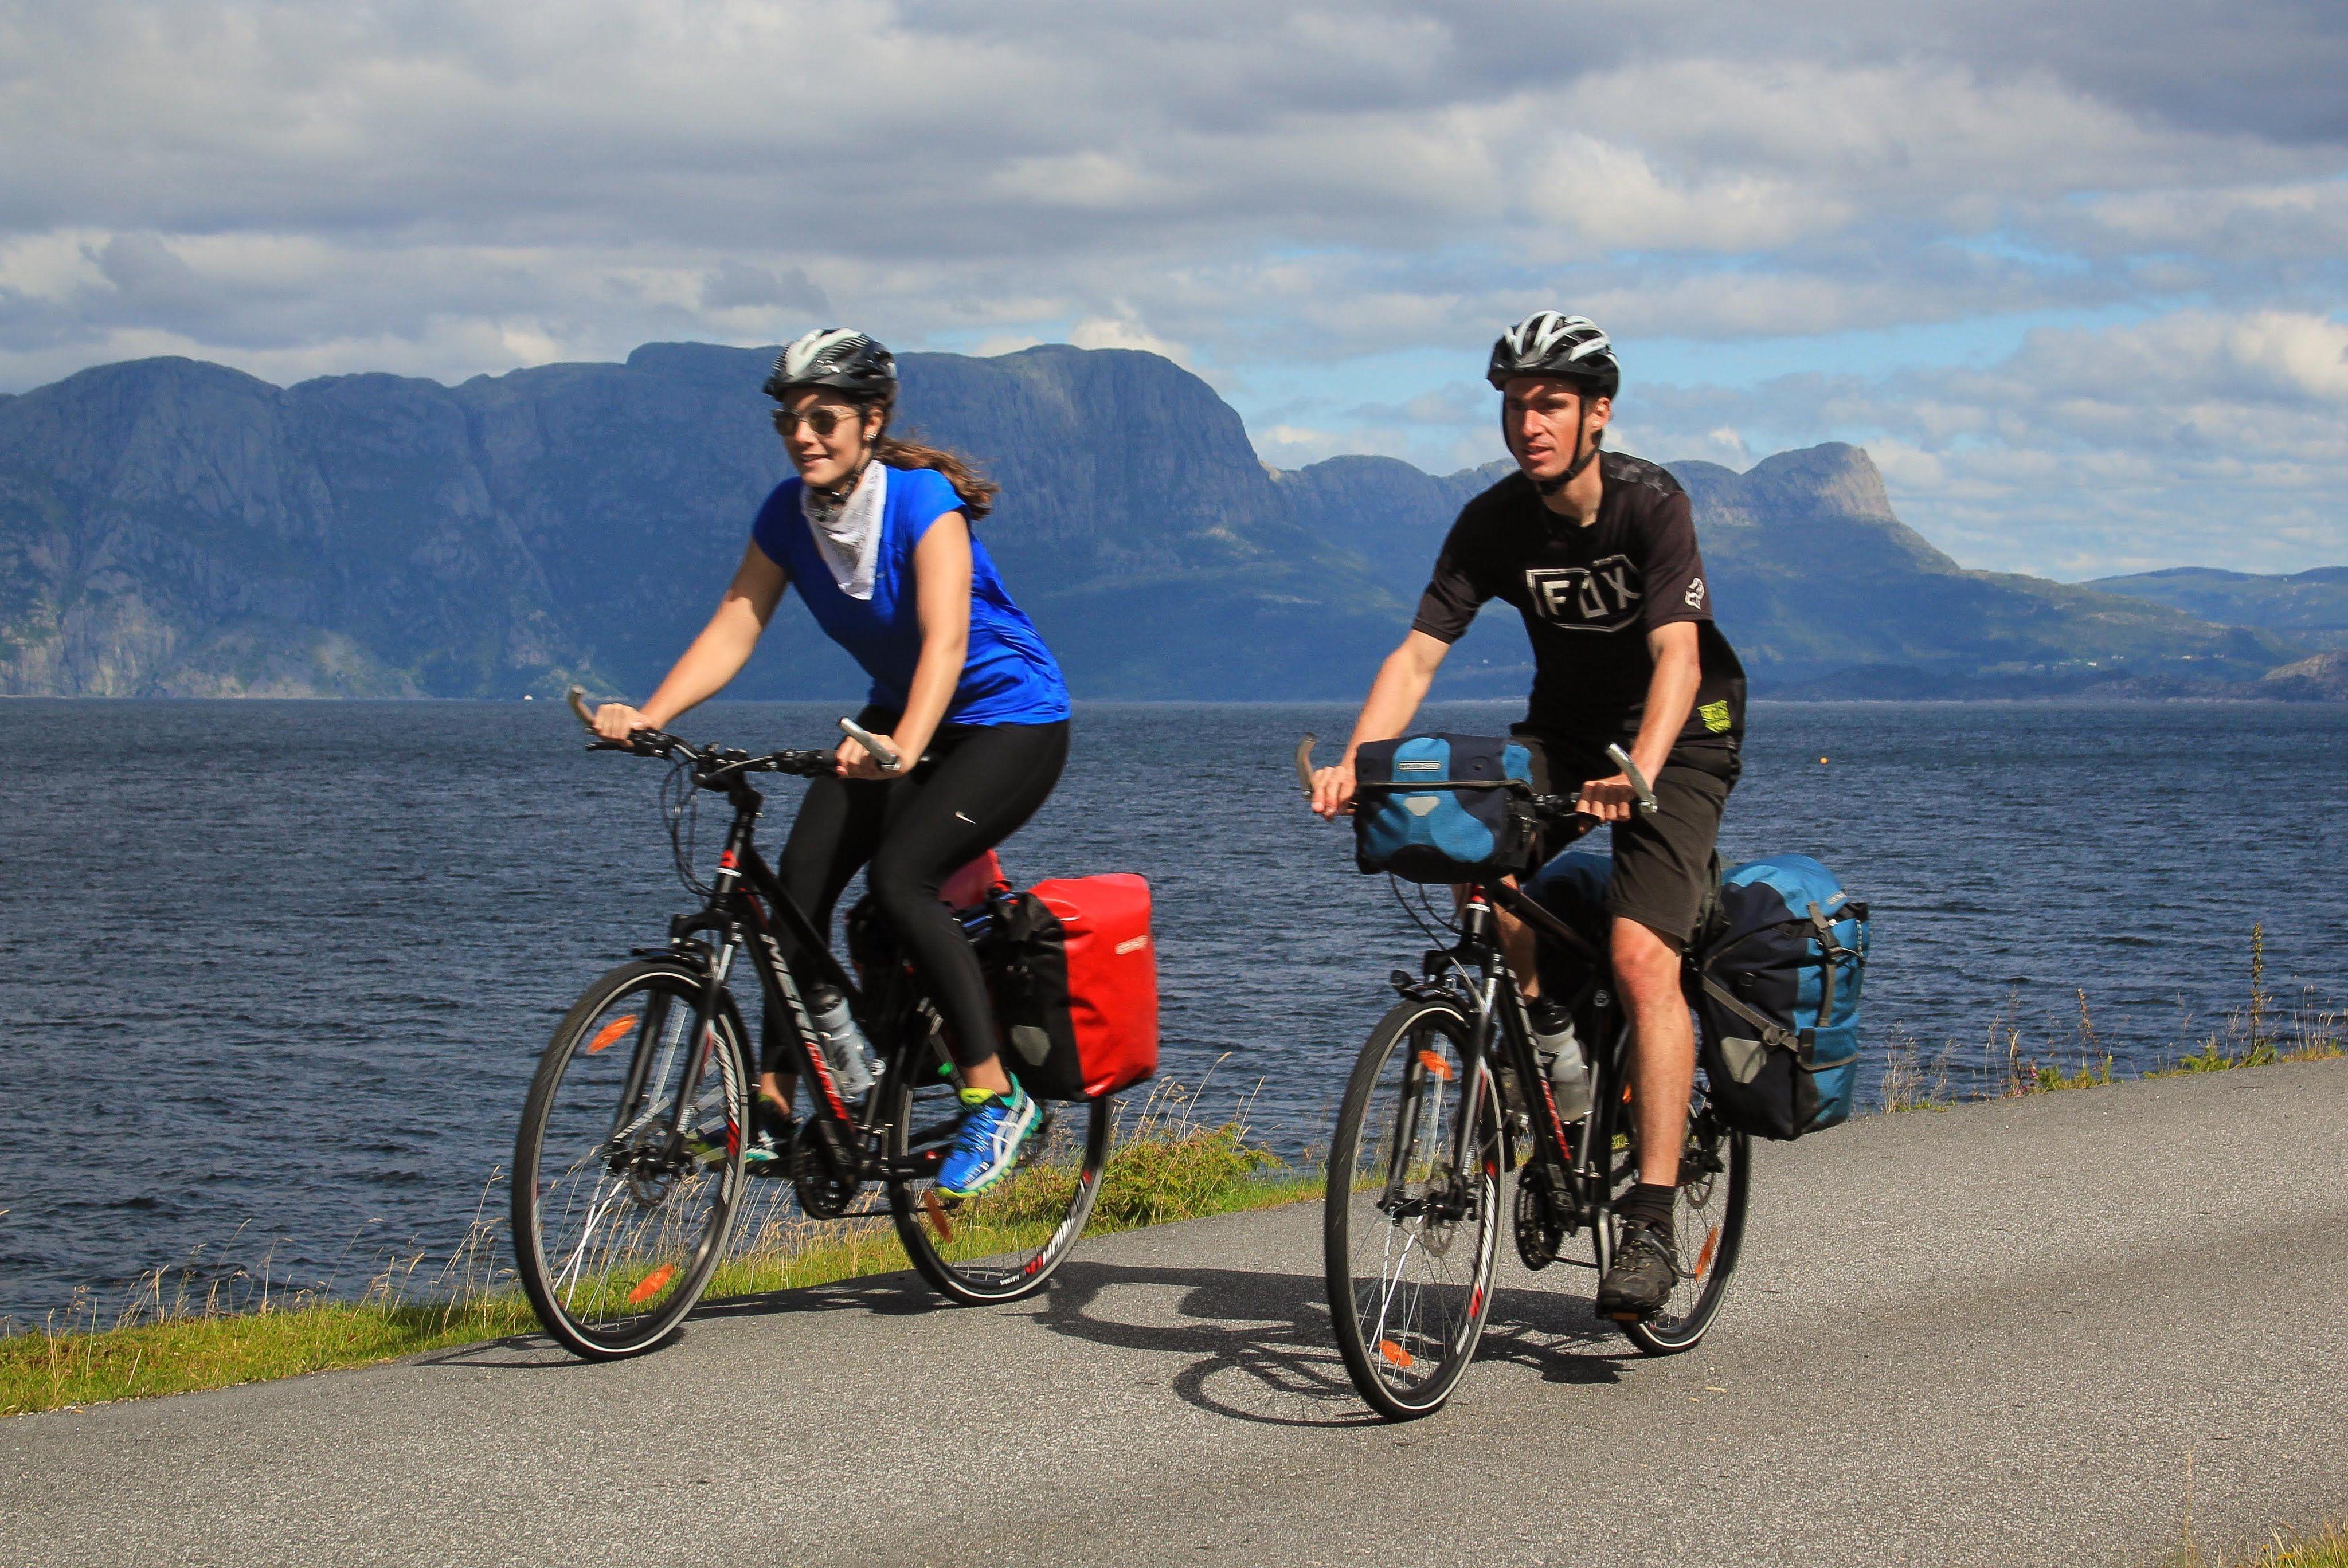 Bike Tours Usa Cycling Vacations Bike Tour Companies Self Guided